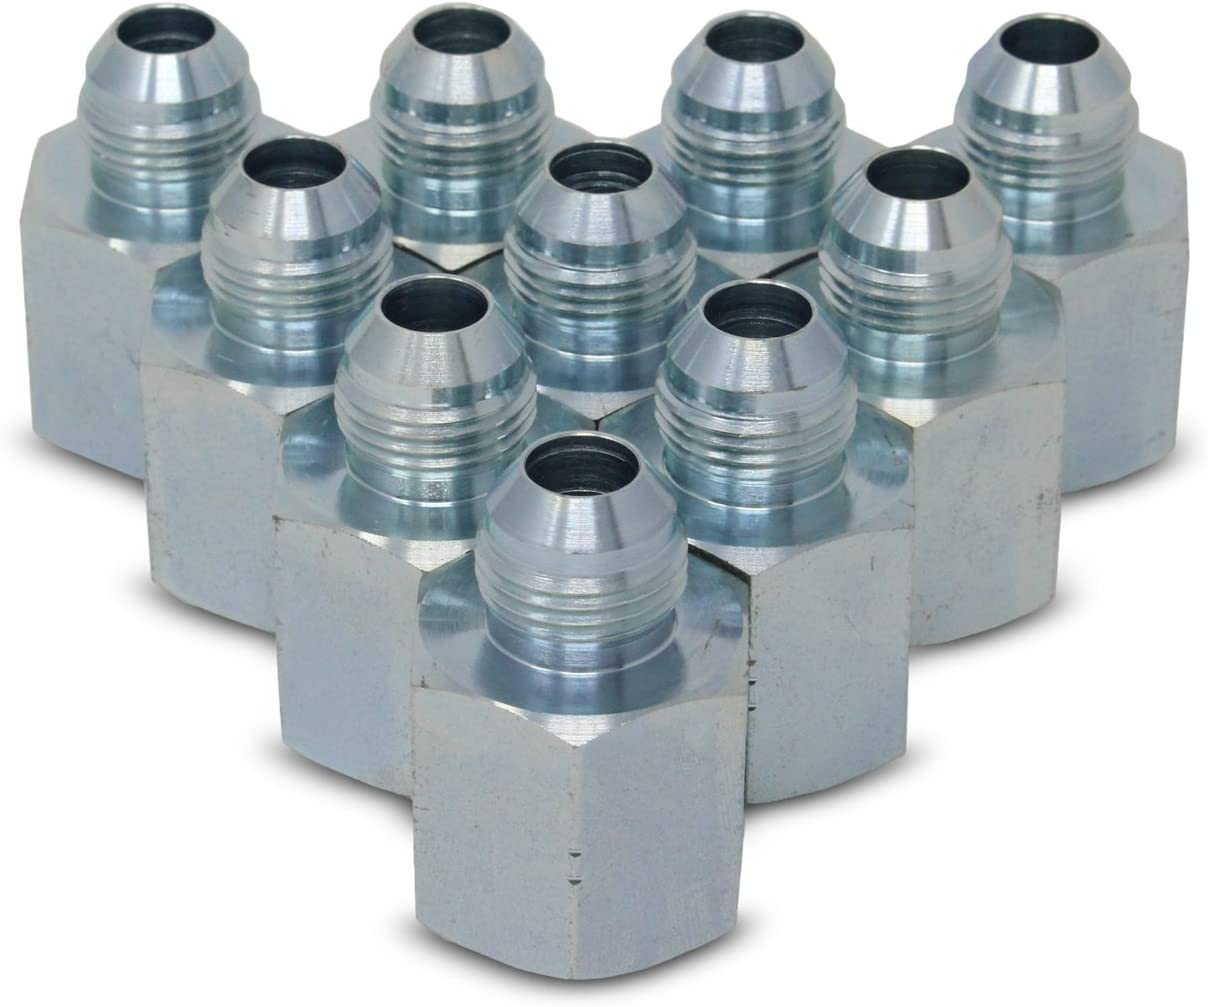 2405-08-08 Hydraulic Adapter Fitting 1 2